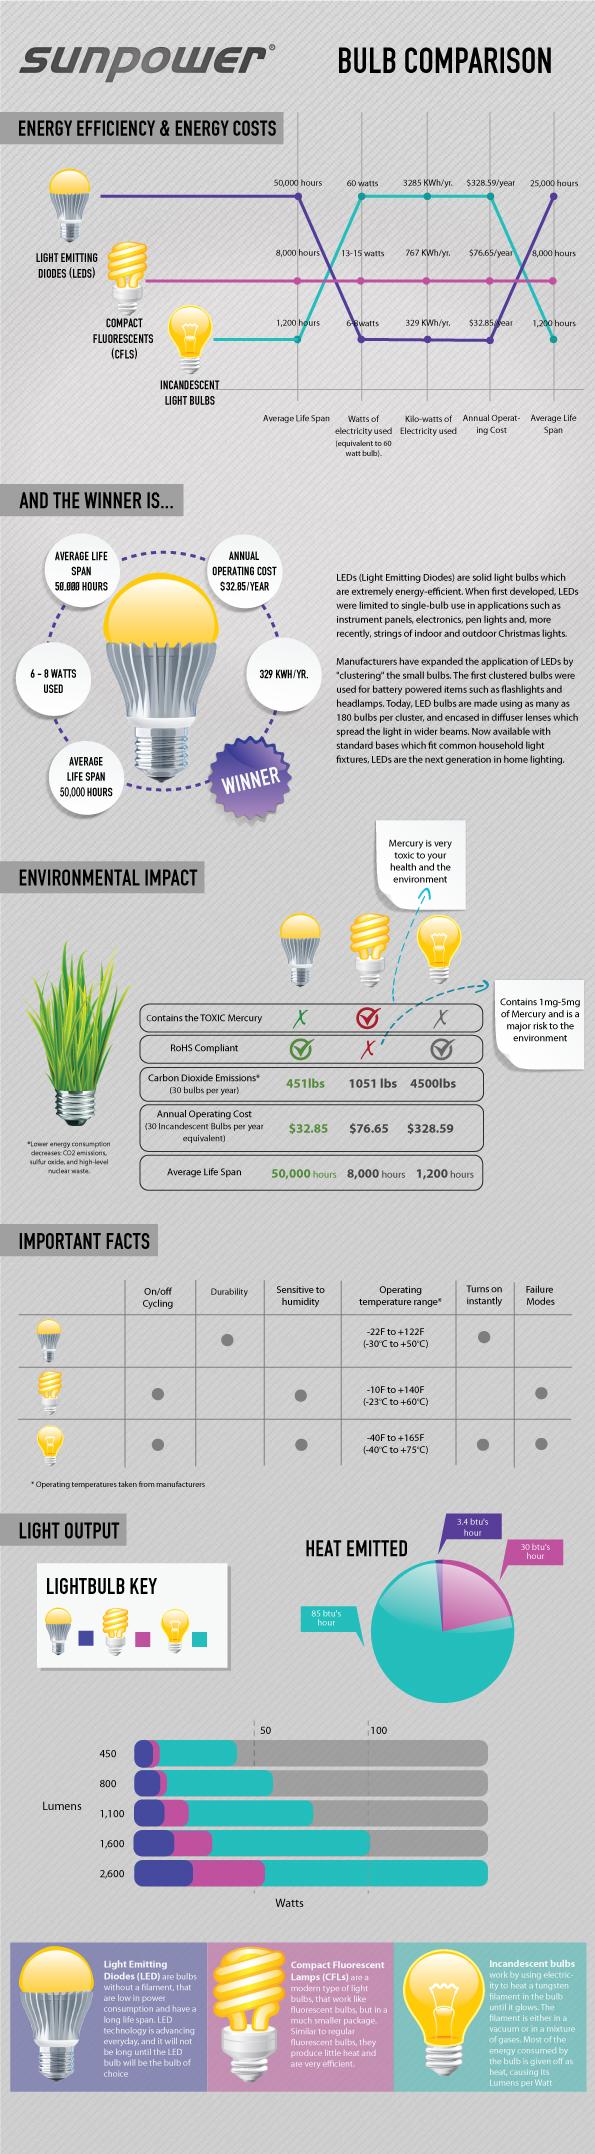 Bulb-comparison-Infographic